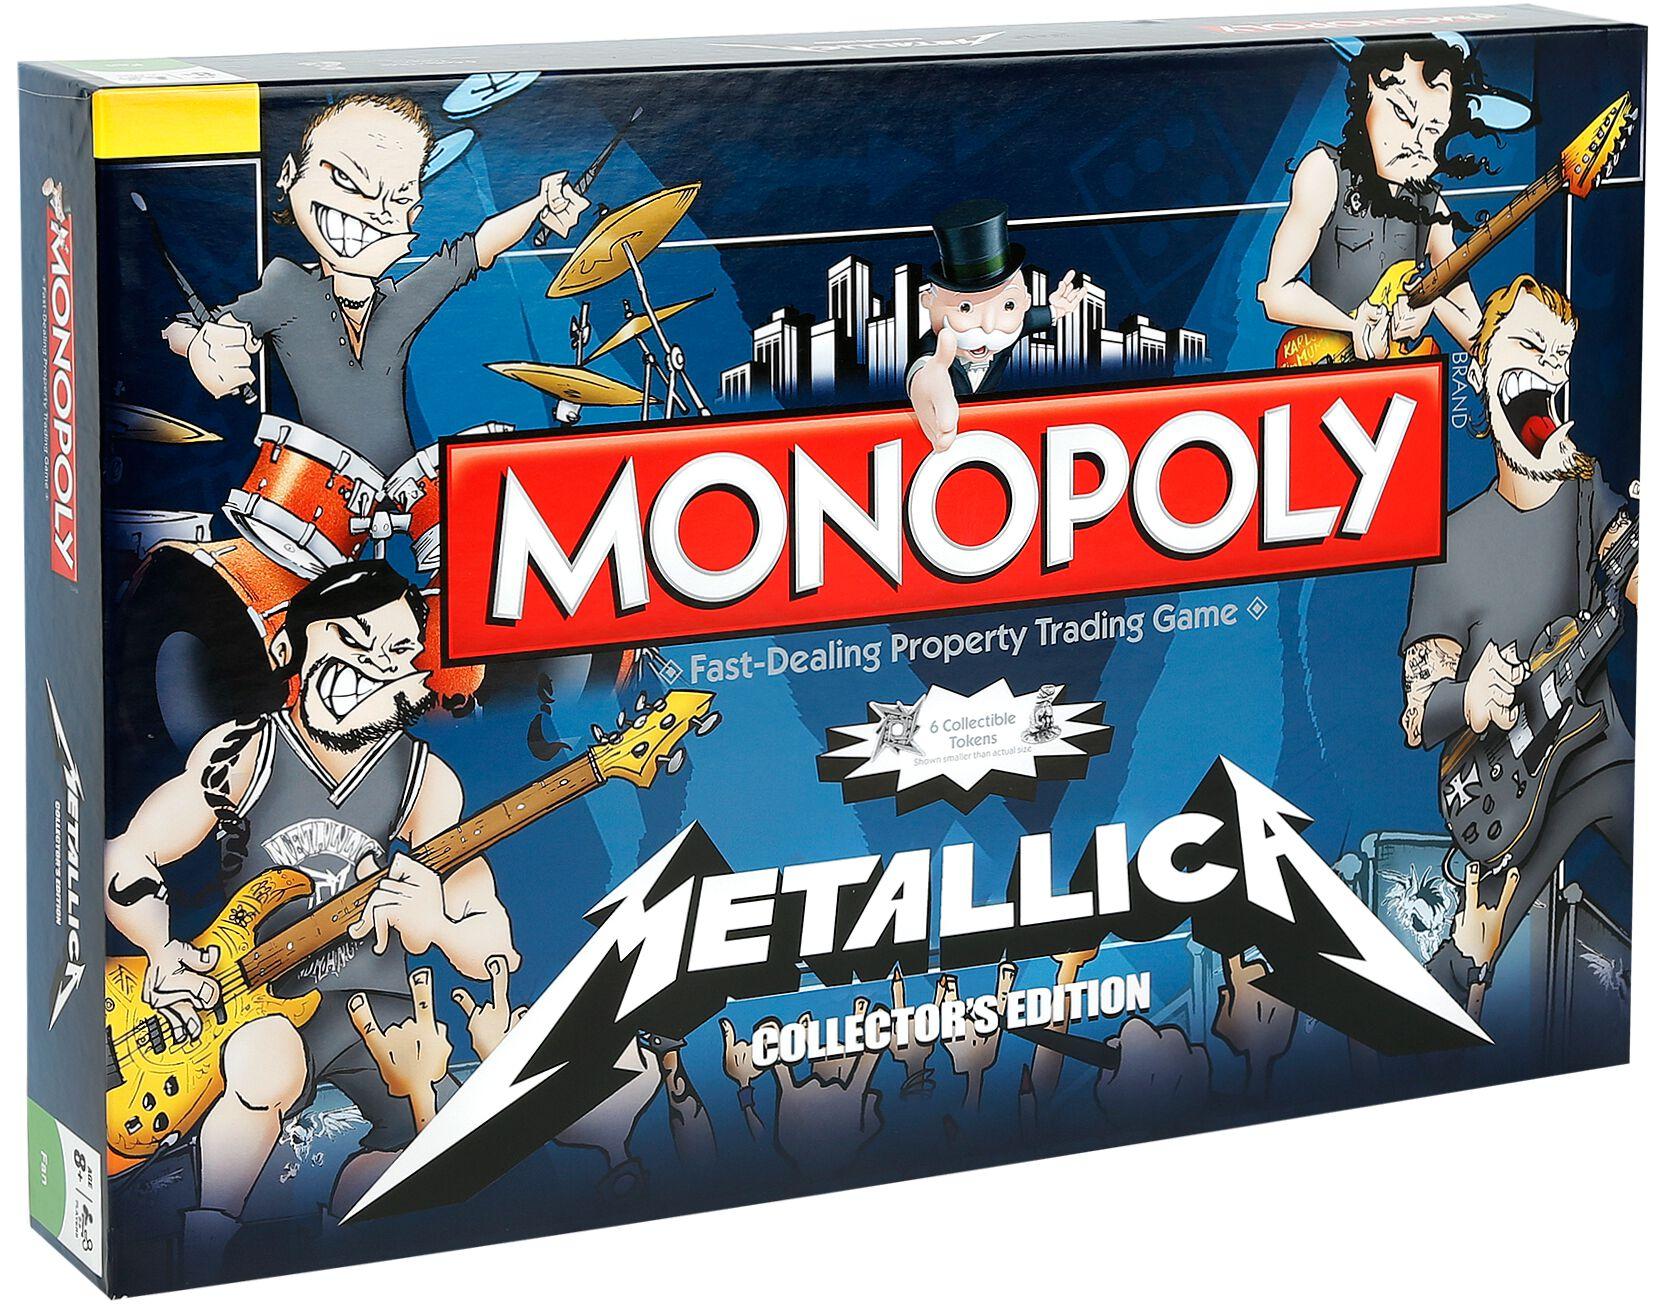 Image of Metallica Monopoly Brettspiel Standard